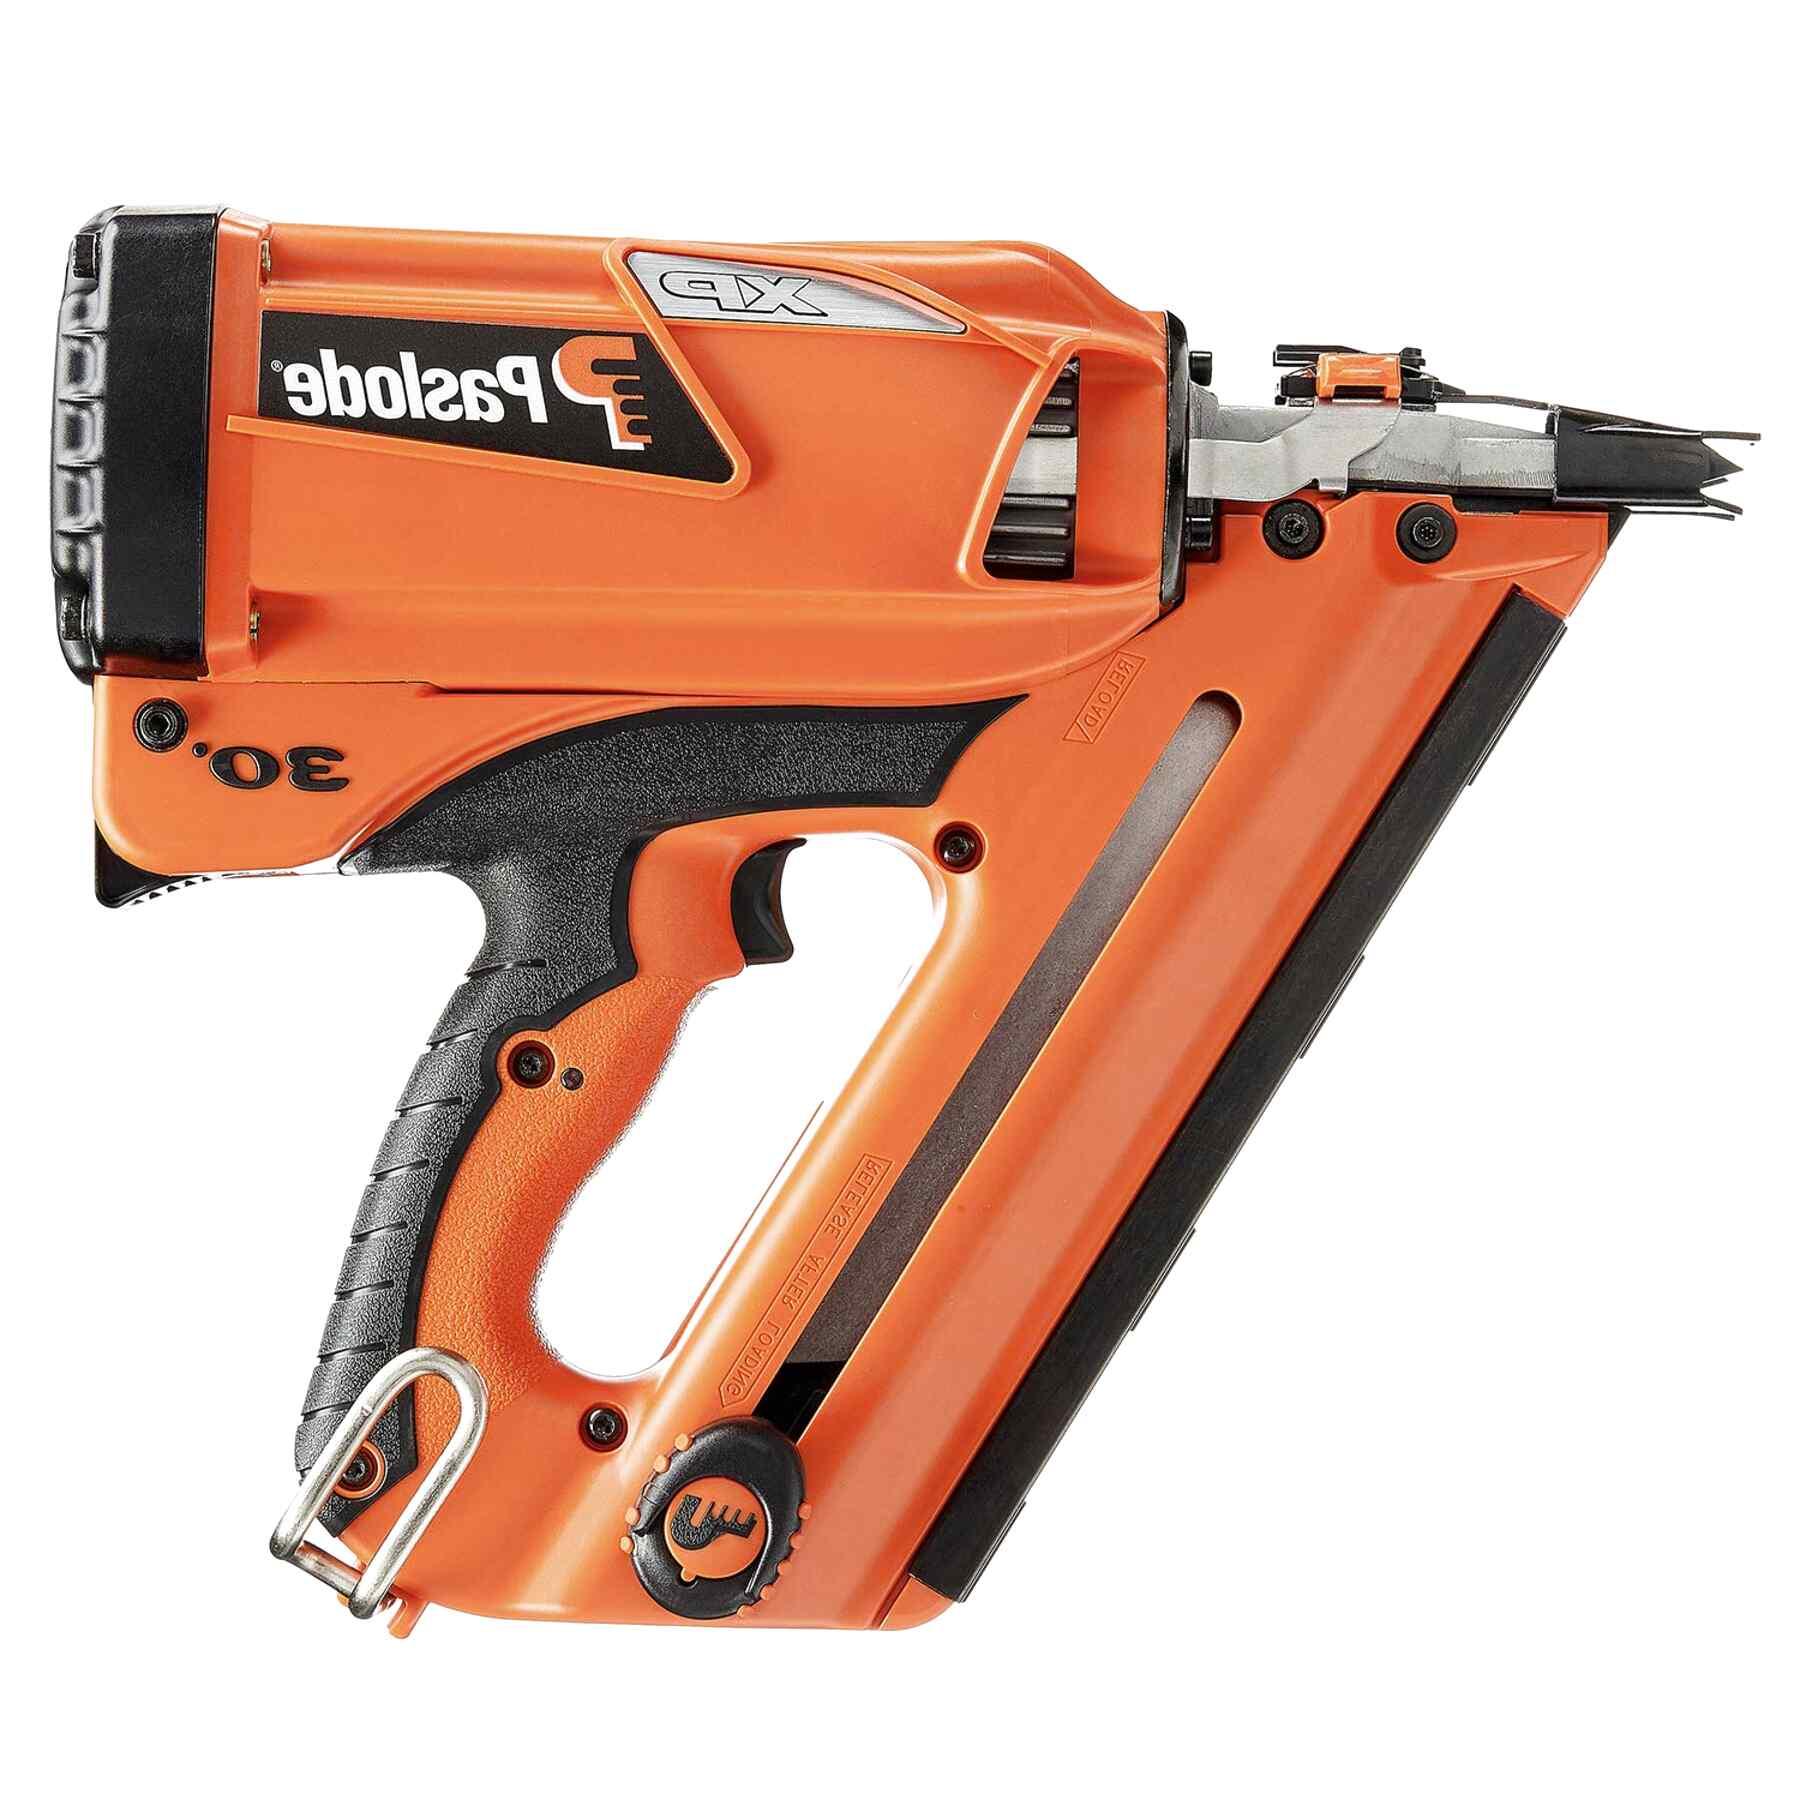 paslode gun for sale